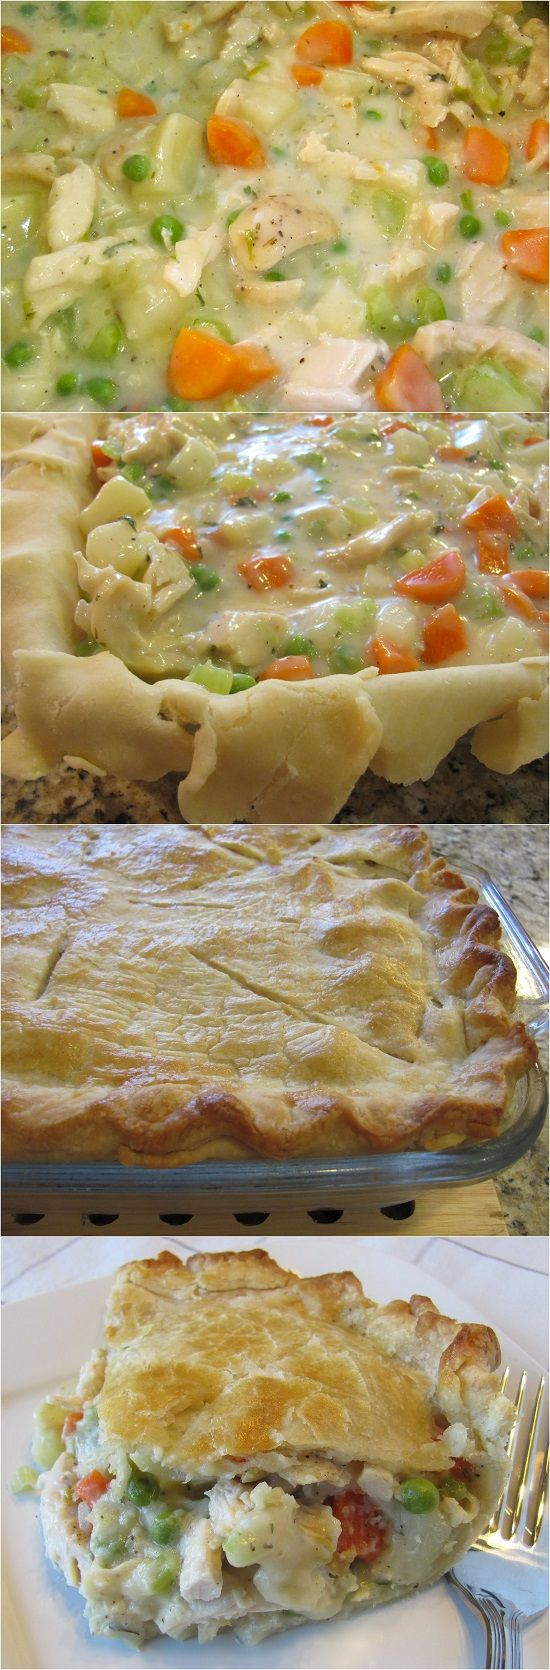 Classic Chicken Pot Pie | Main Dish recipes | Pinterest